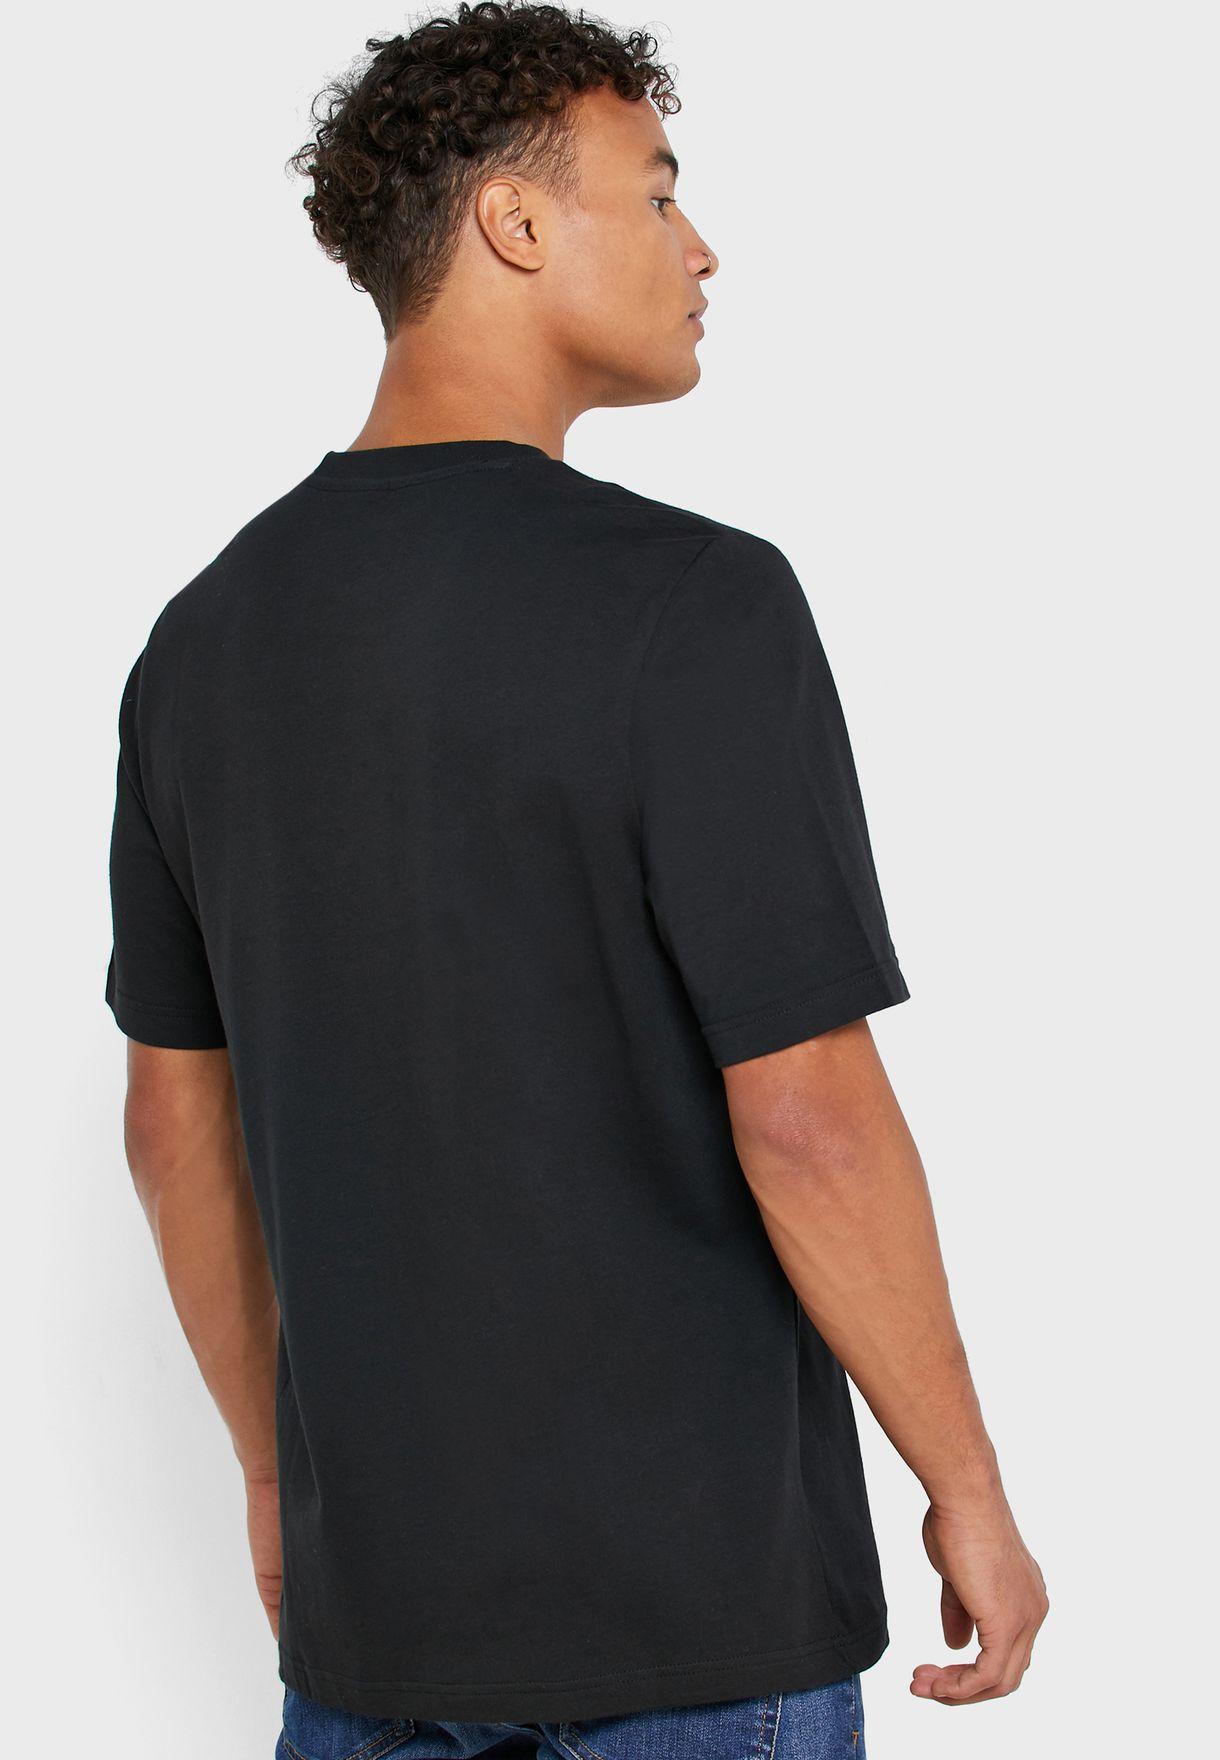 Classics Gold T-Shirt